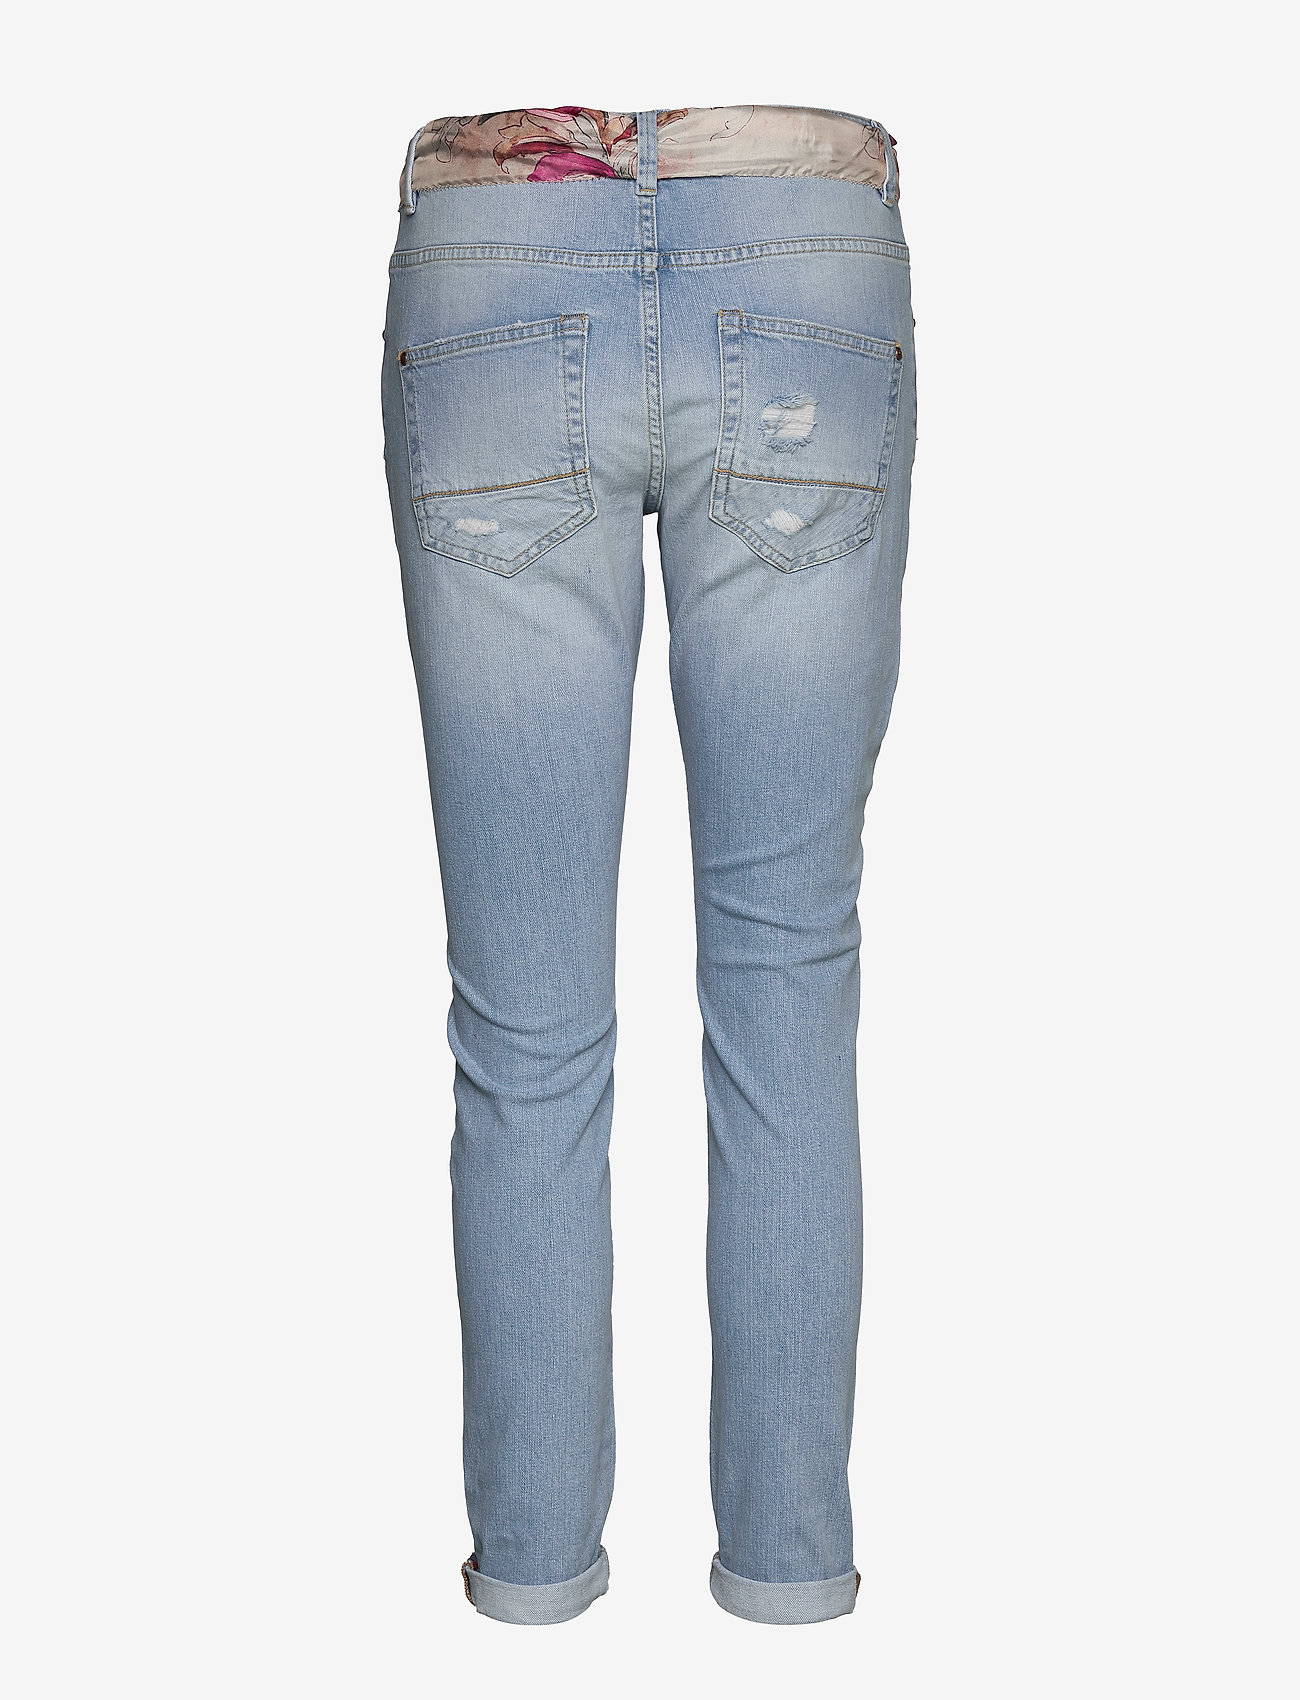 MOS MOSH - Bradford Bleach Jeans - dżinsy chłopaka - bleached blue - 1